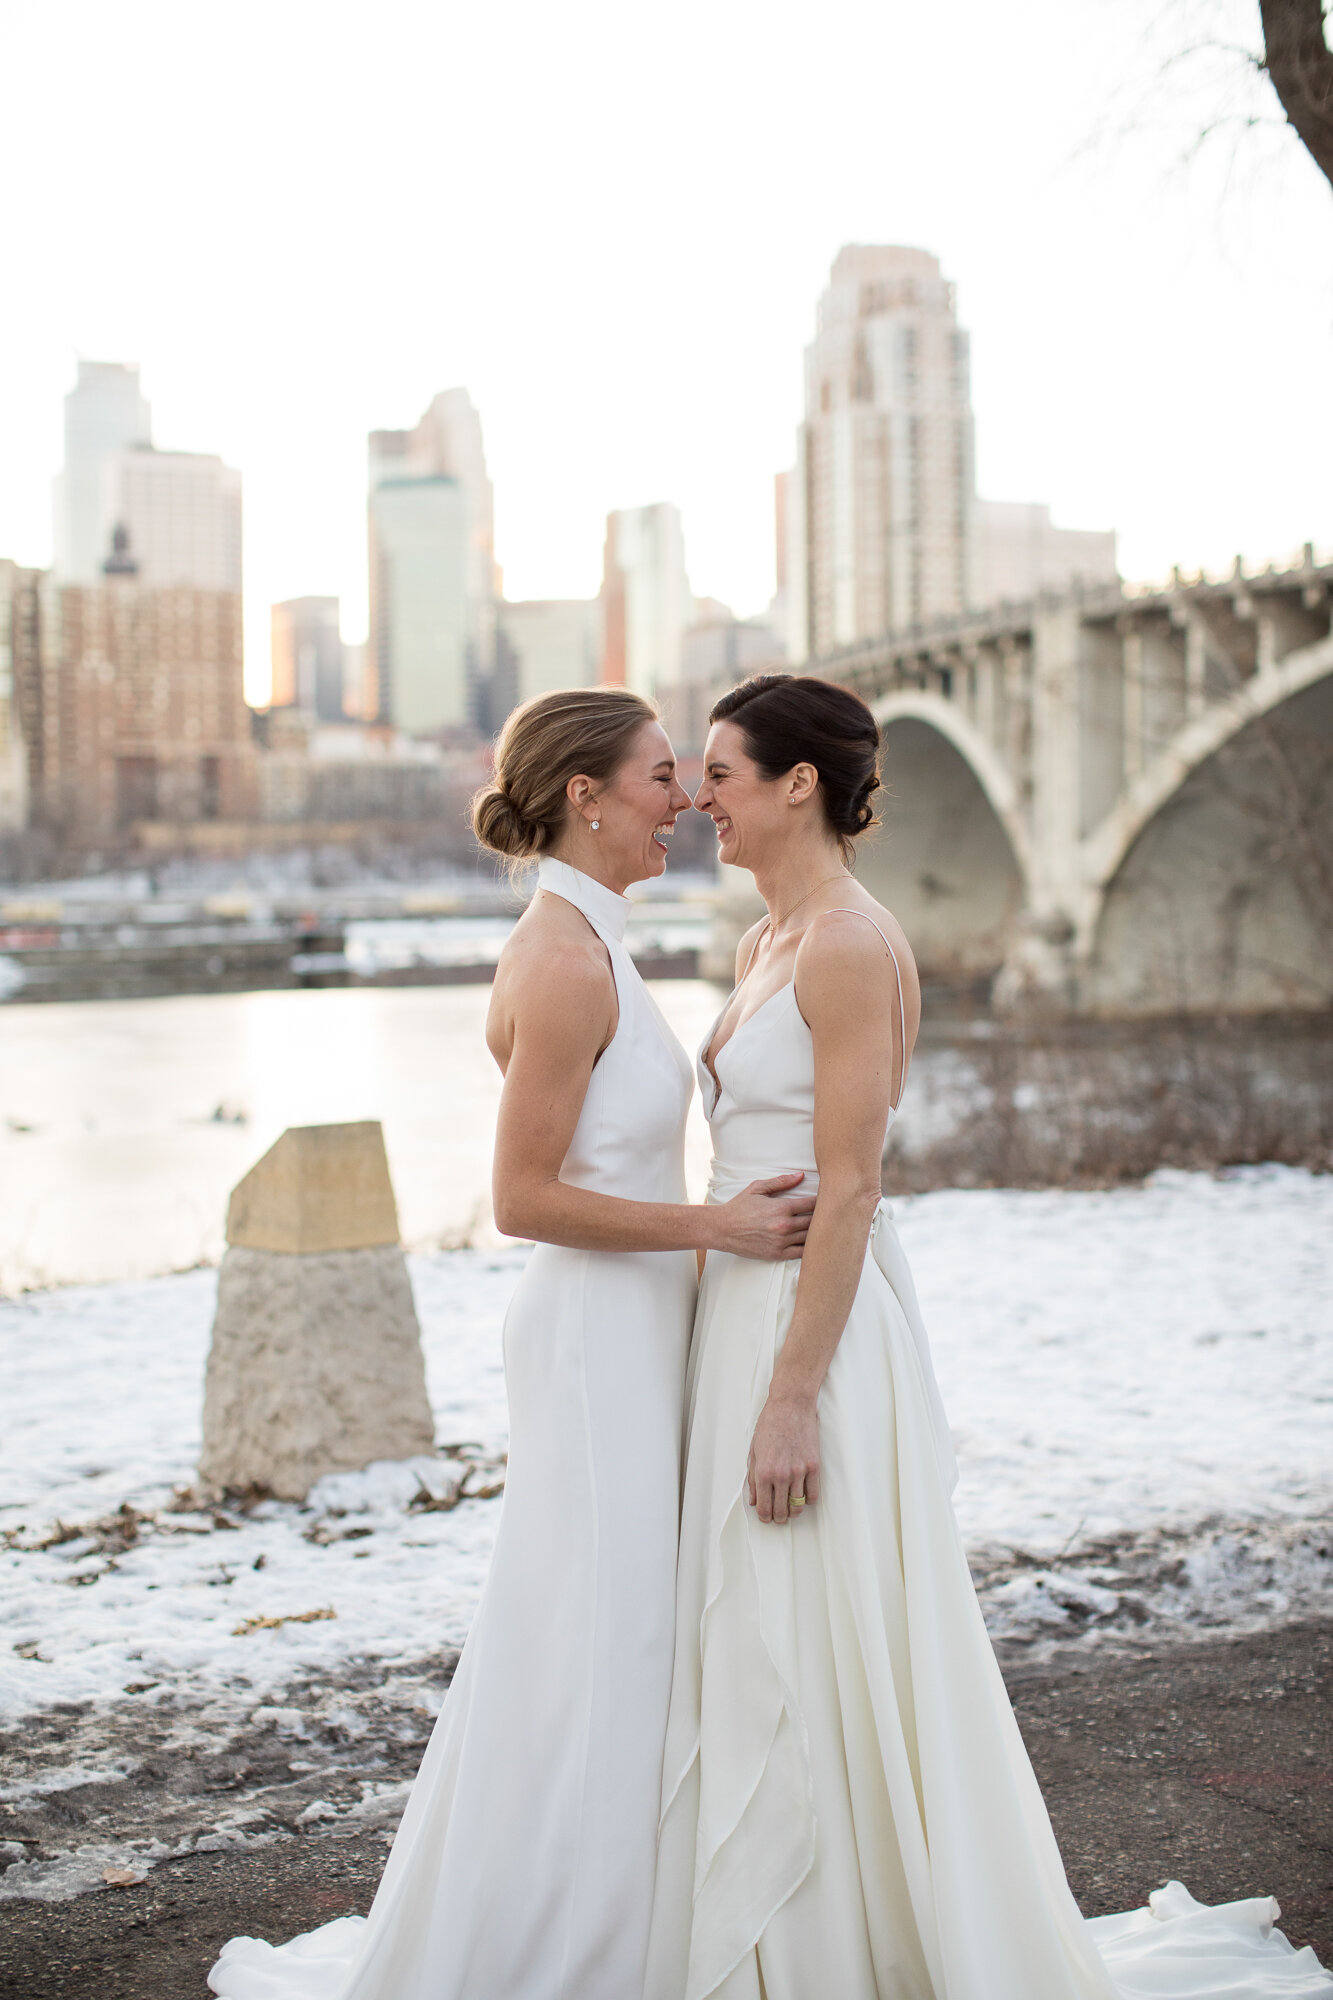 Heidi Molly S Custom Wedding Gowns Custom Wedding Gown Minneapolis Wedding Shop Bridal Gown Modehaus,Second Wedding Wedding Dress Mature Bride